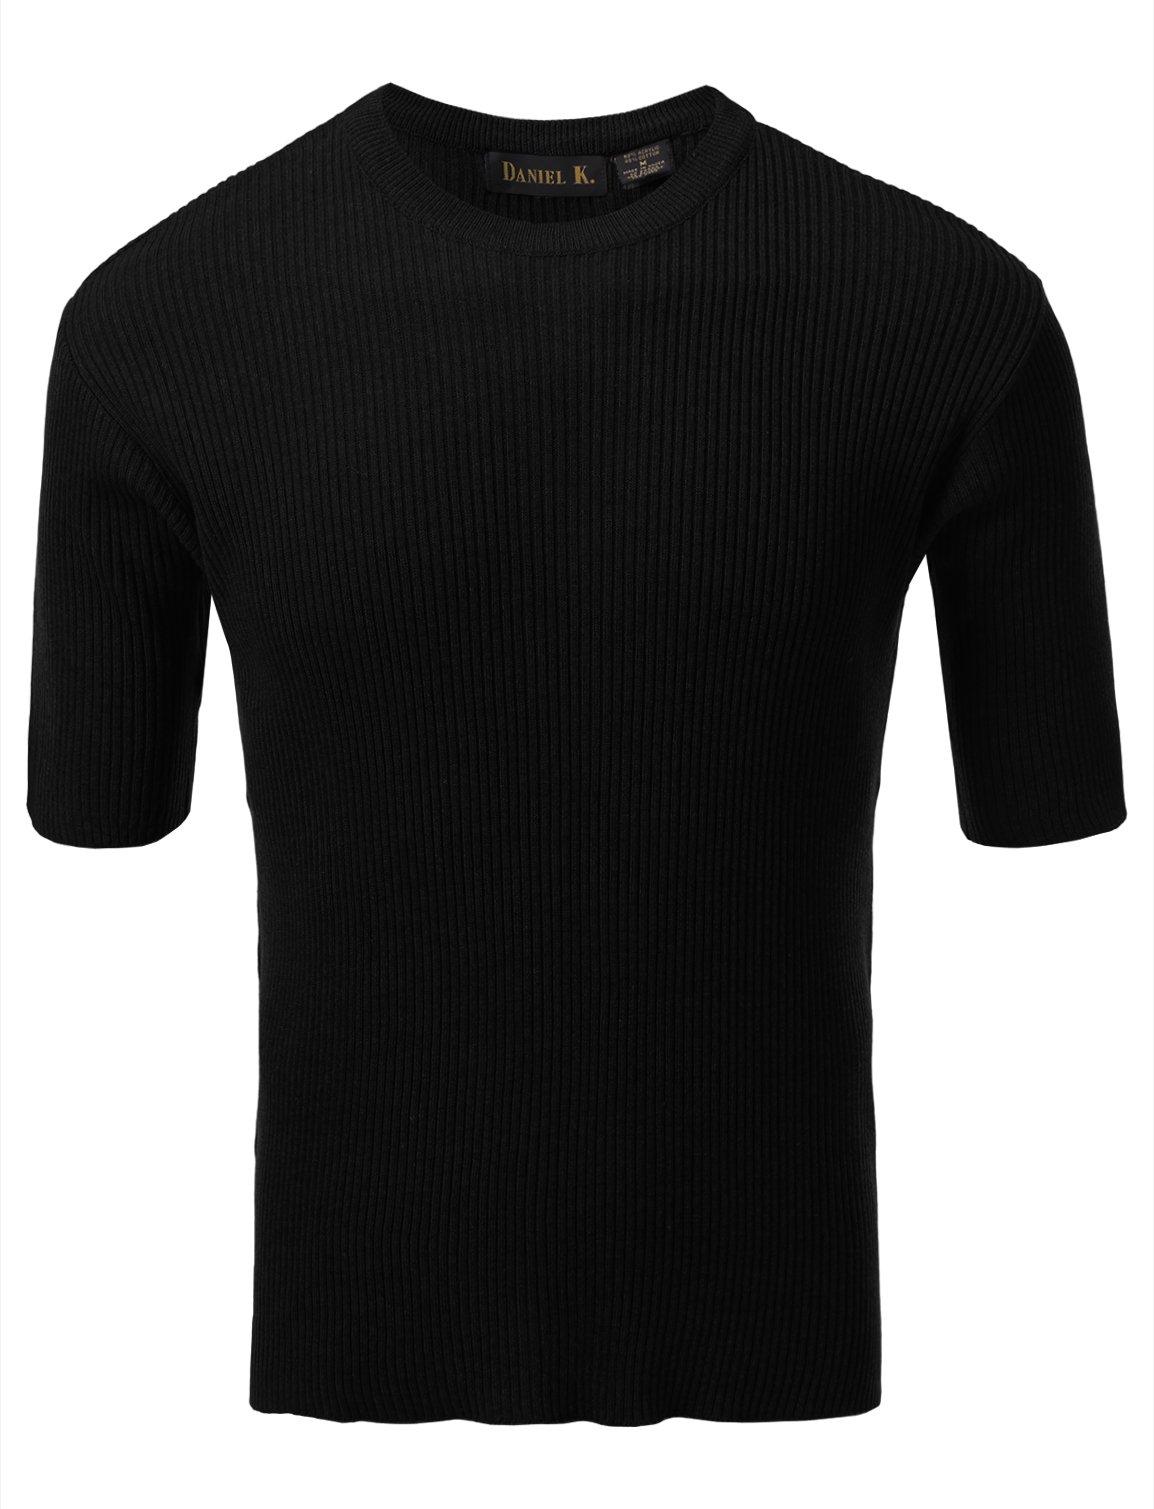 7 Encounter Men's Crewneck Short Sleeve Small Ribbed Sweater Black M